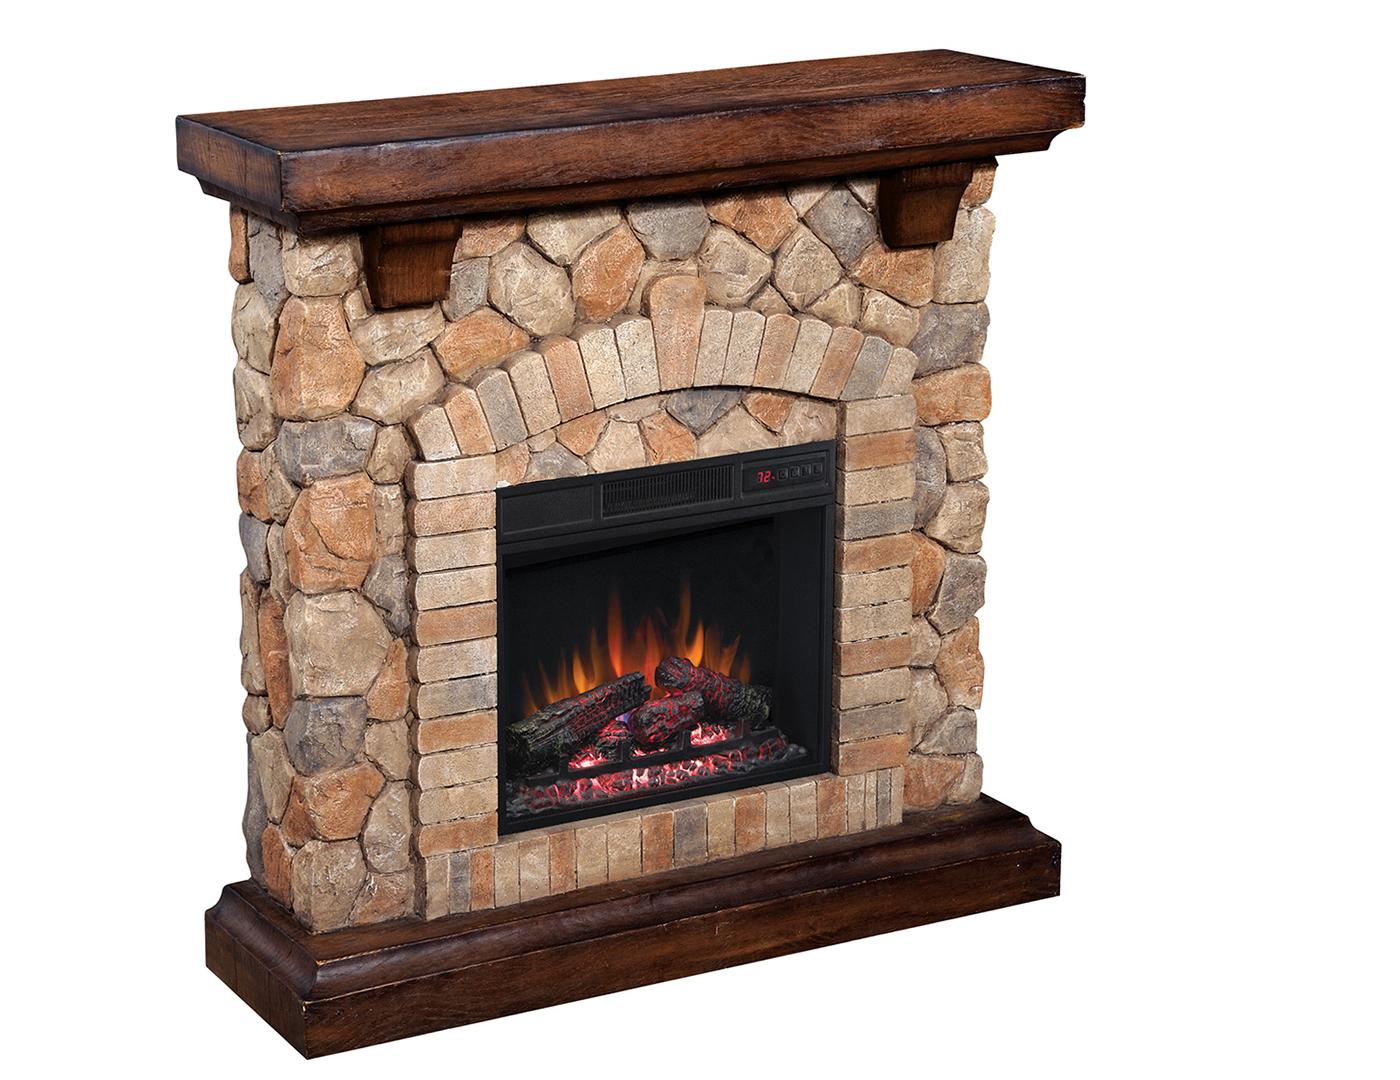 Fieldstone Fireplace Product : Steinhafels austin fireplace